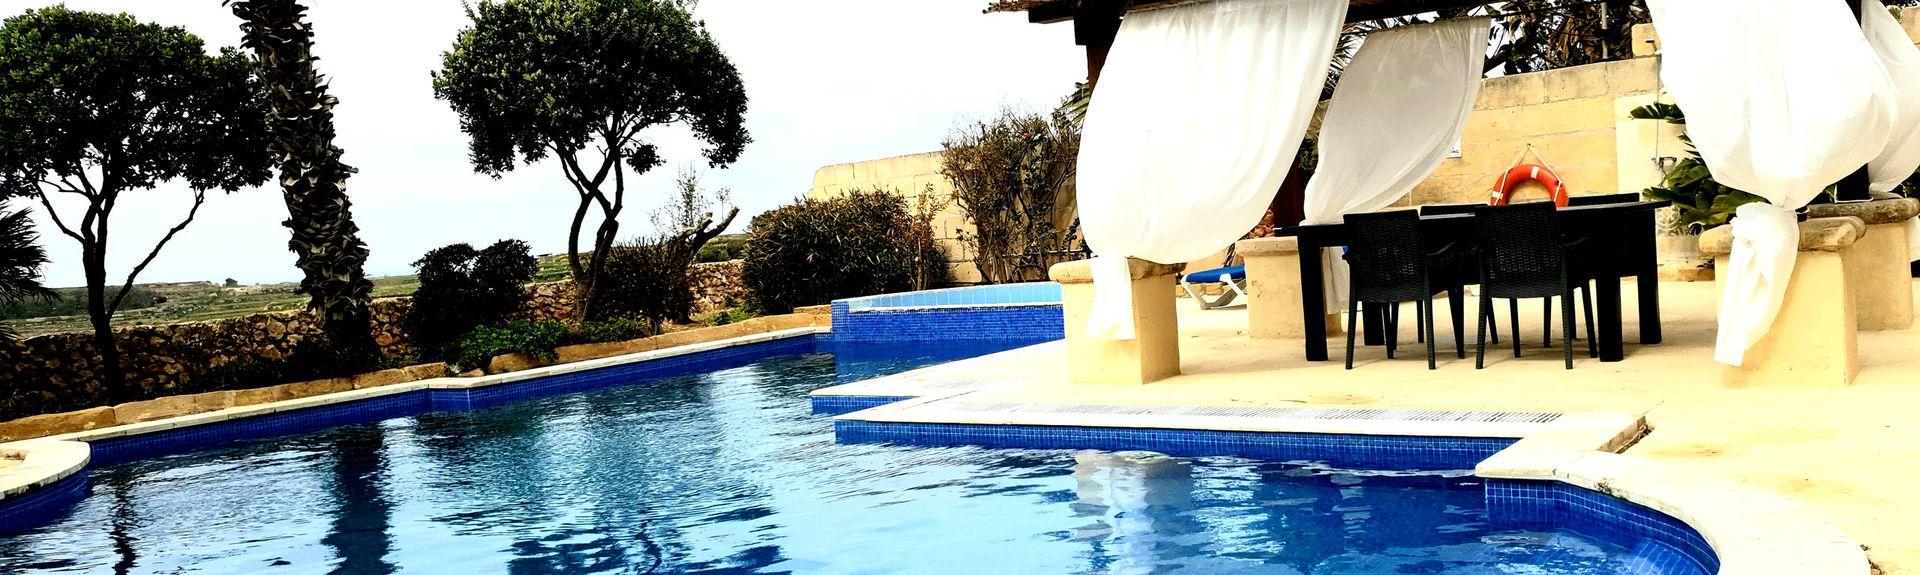 Xlendi, Munxar, Malta